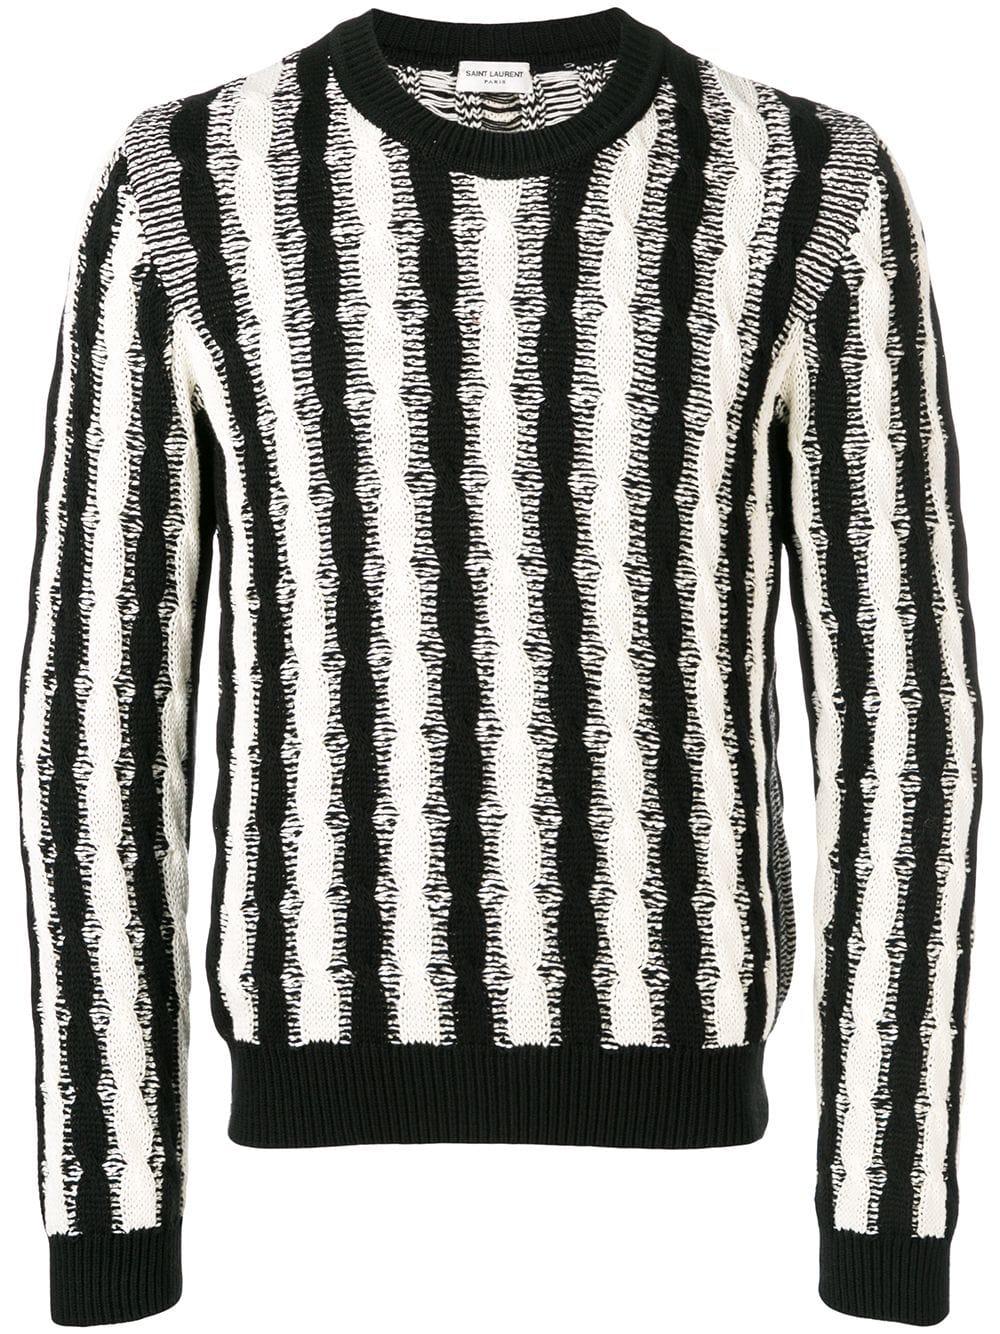 21f587320a64 Saint Laurent Striped Sweater - Black